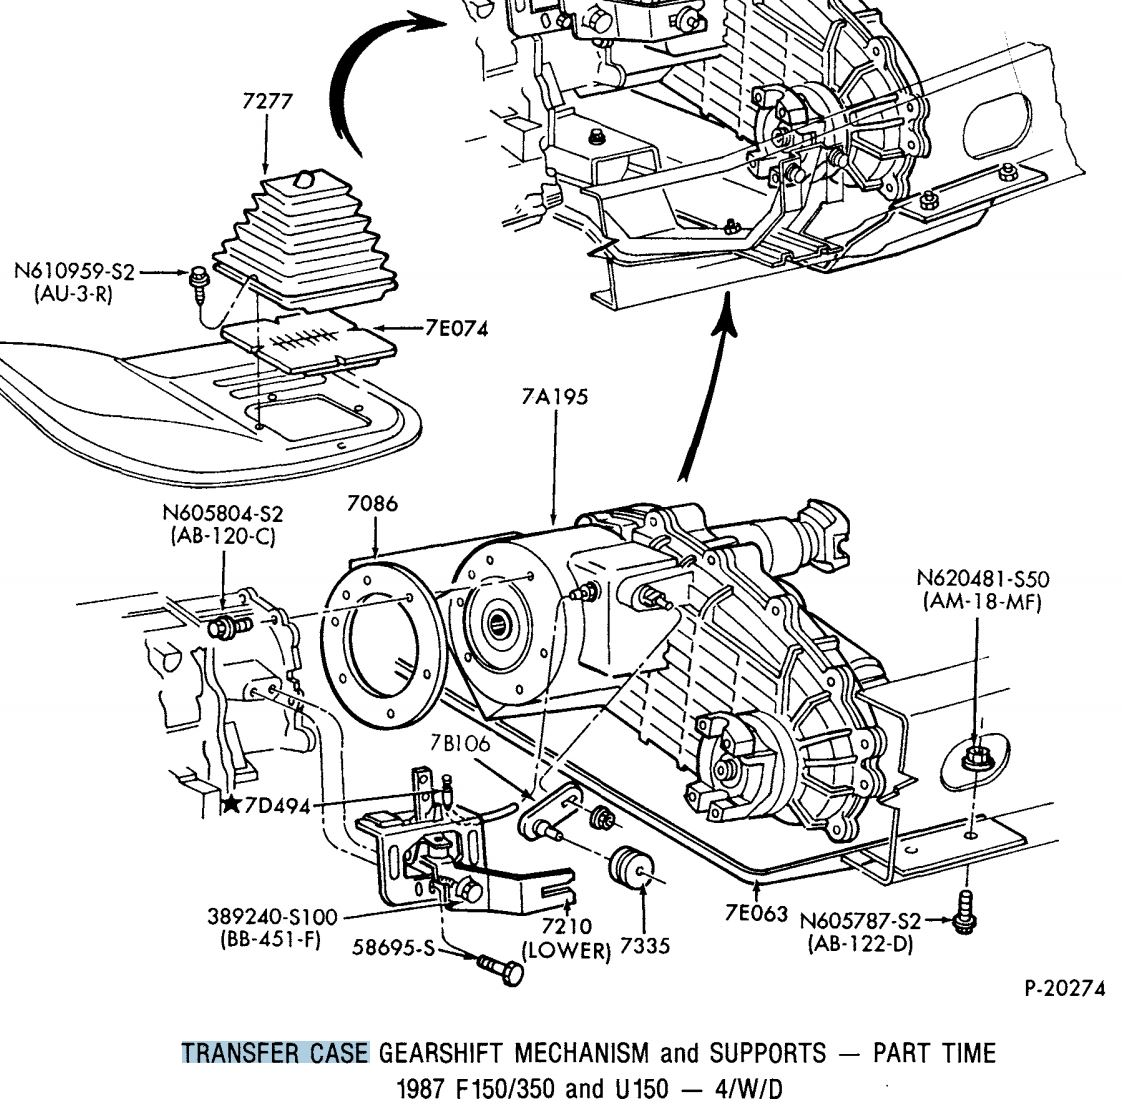 1992 Ford F150 Transfer Case Diagram Wiring Diagrams Schema